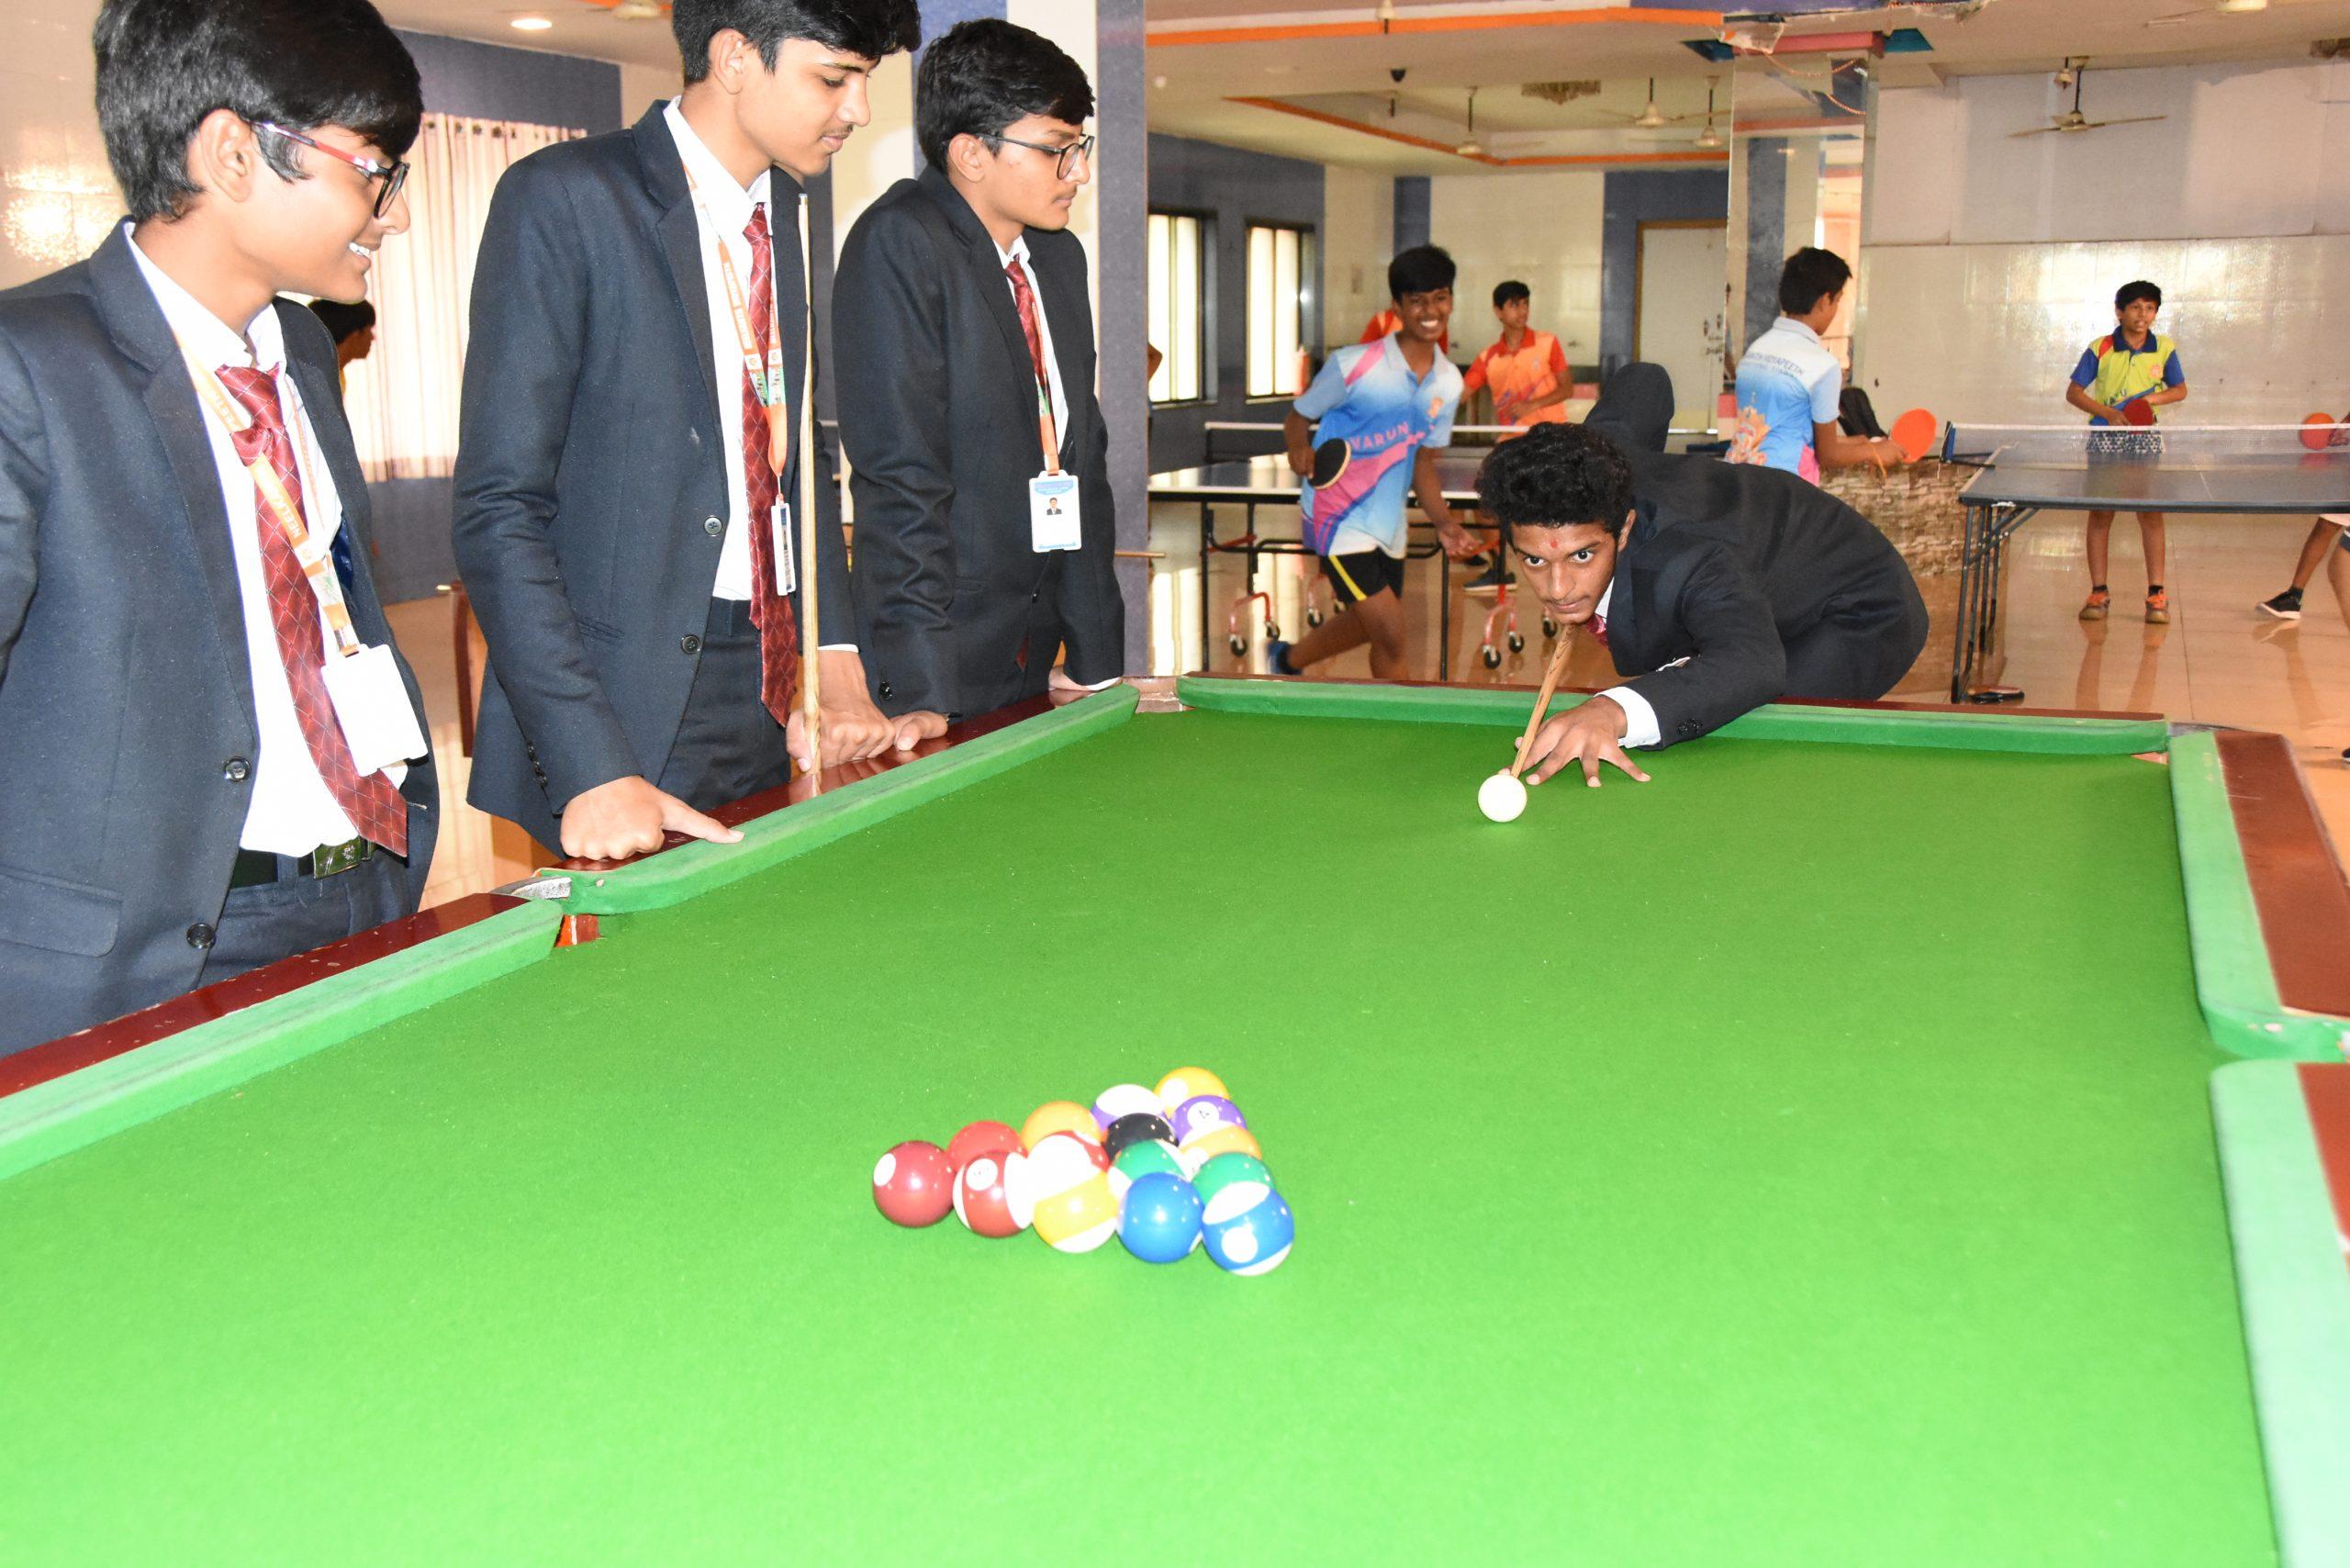 SHREE NEELAKANTH VIDYAPEETH Students Playing Indoor Games